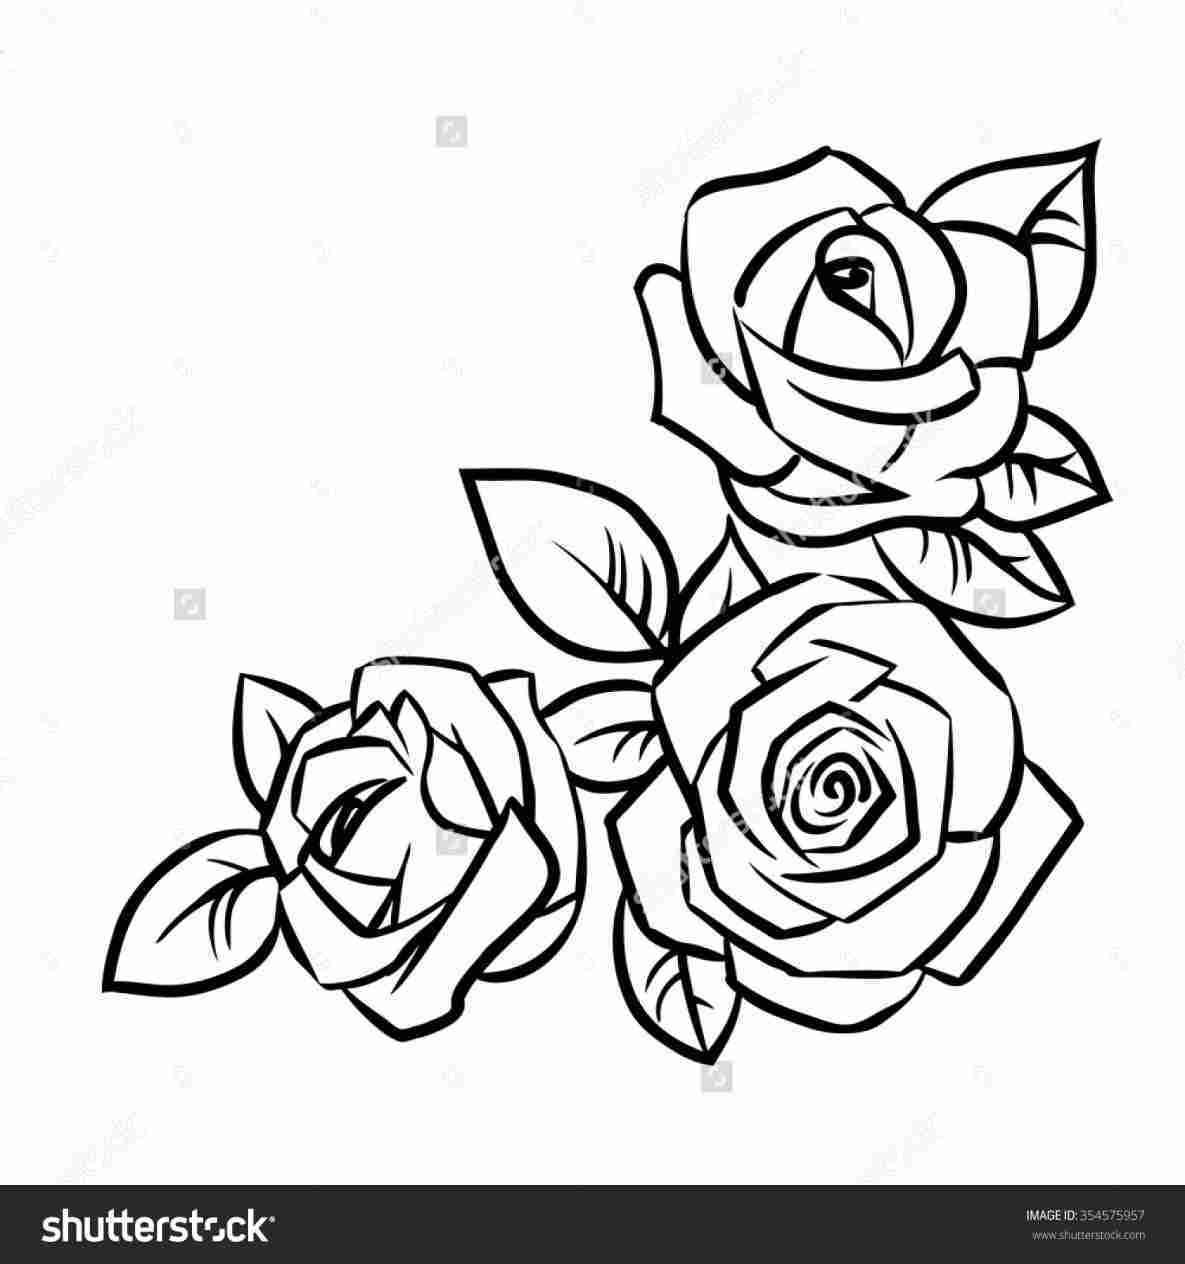 1185x1264 Rose Easy Simple Flowers Drawing